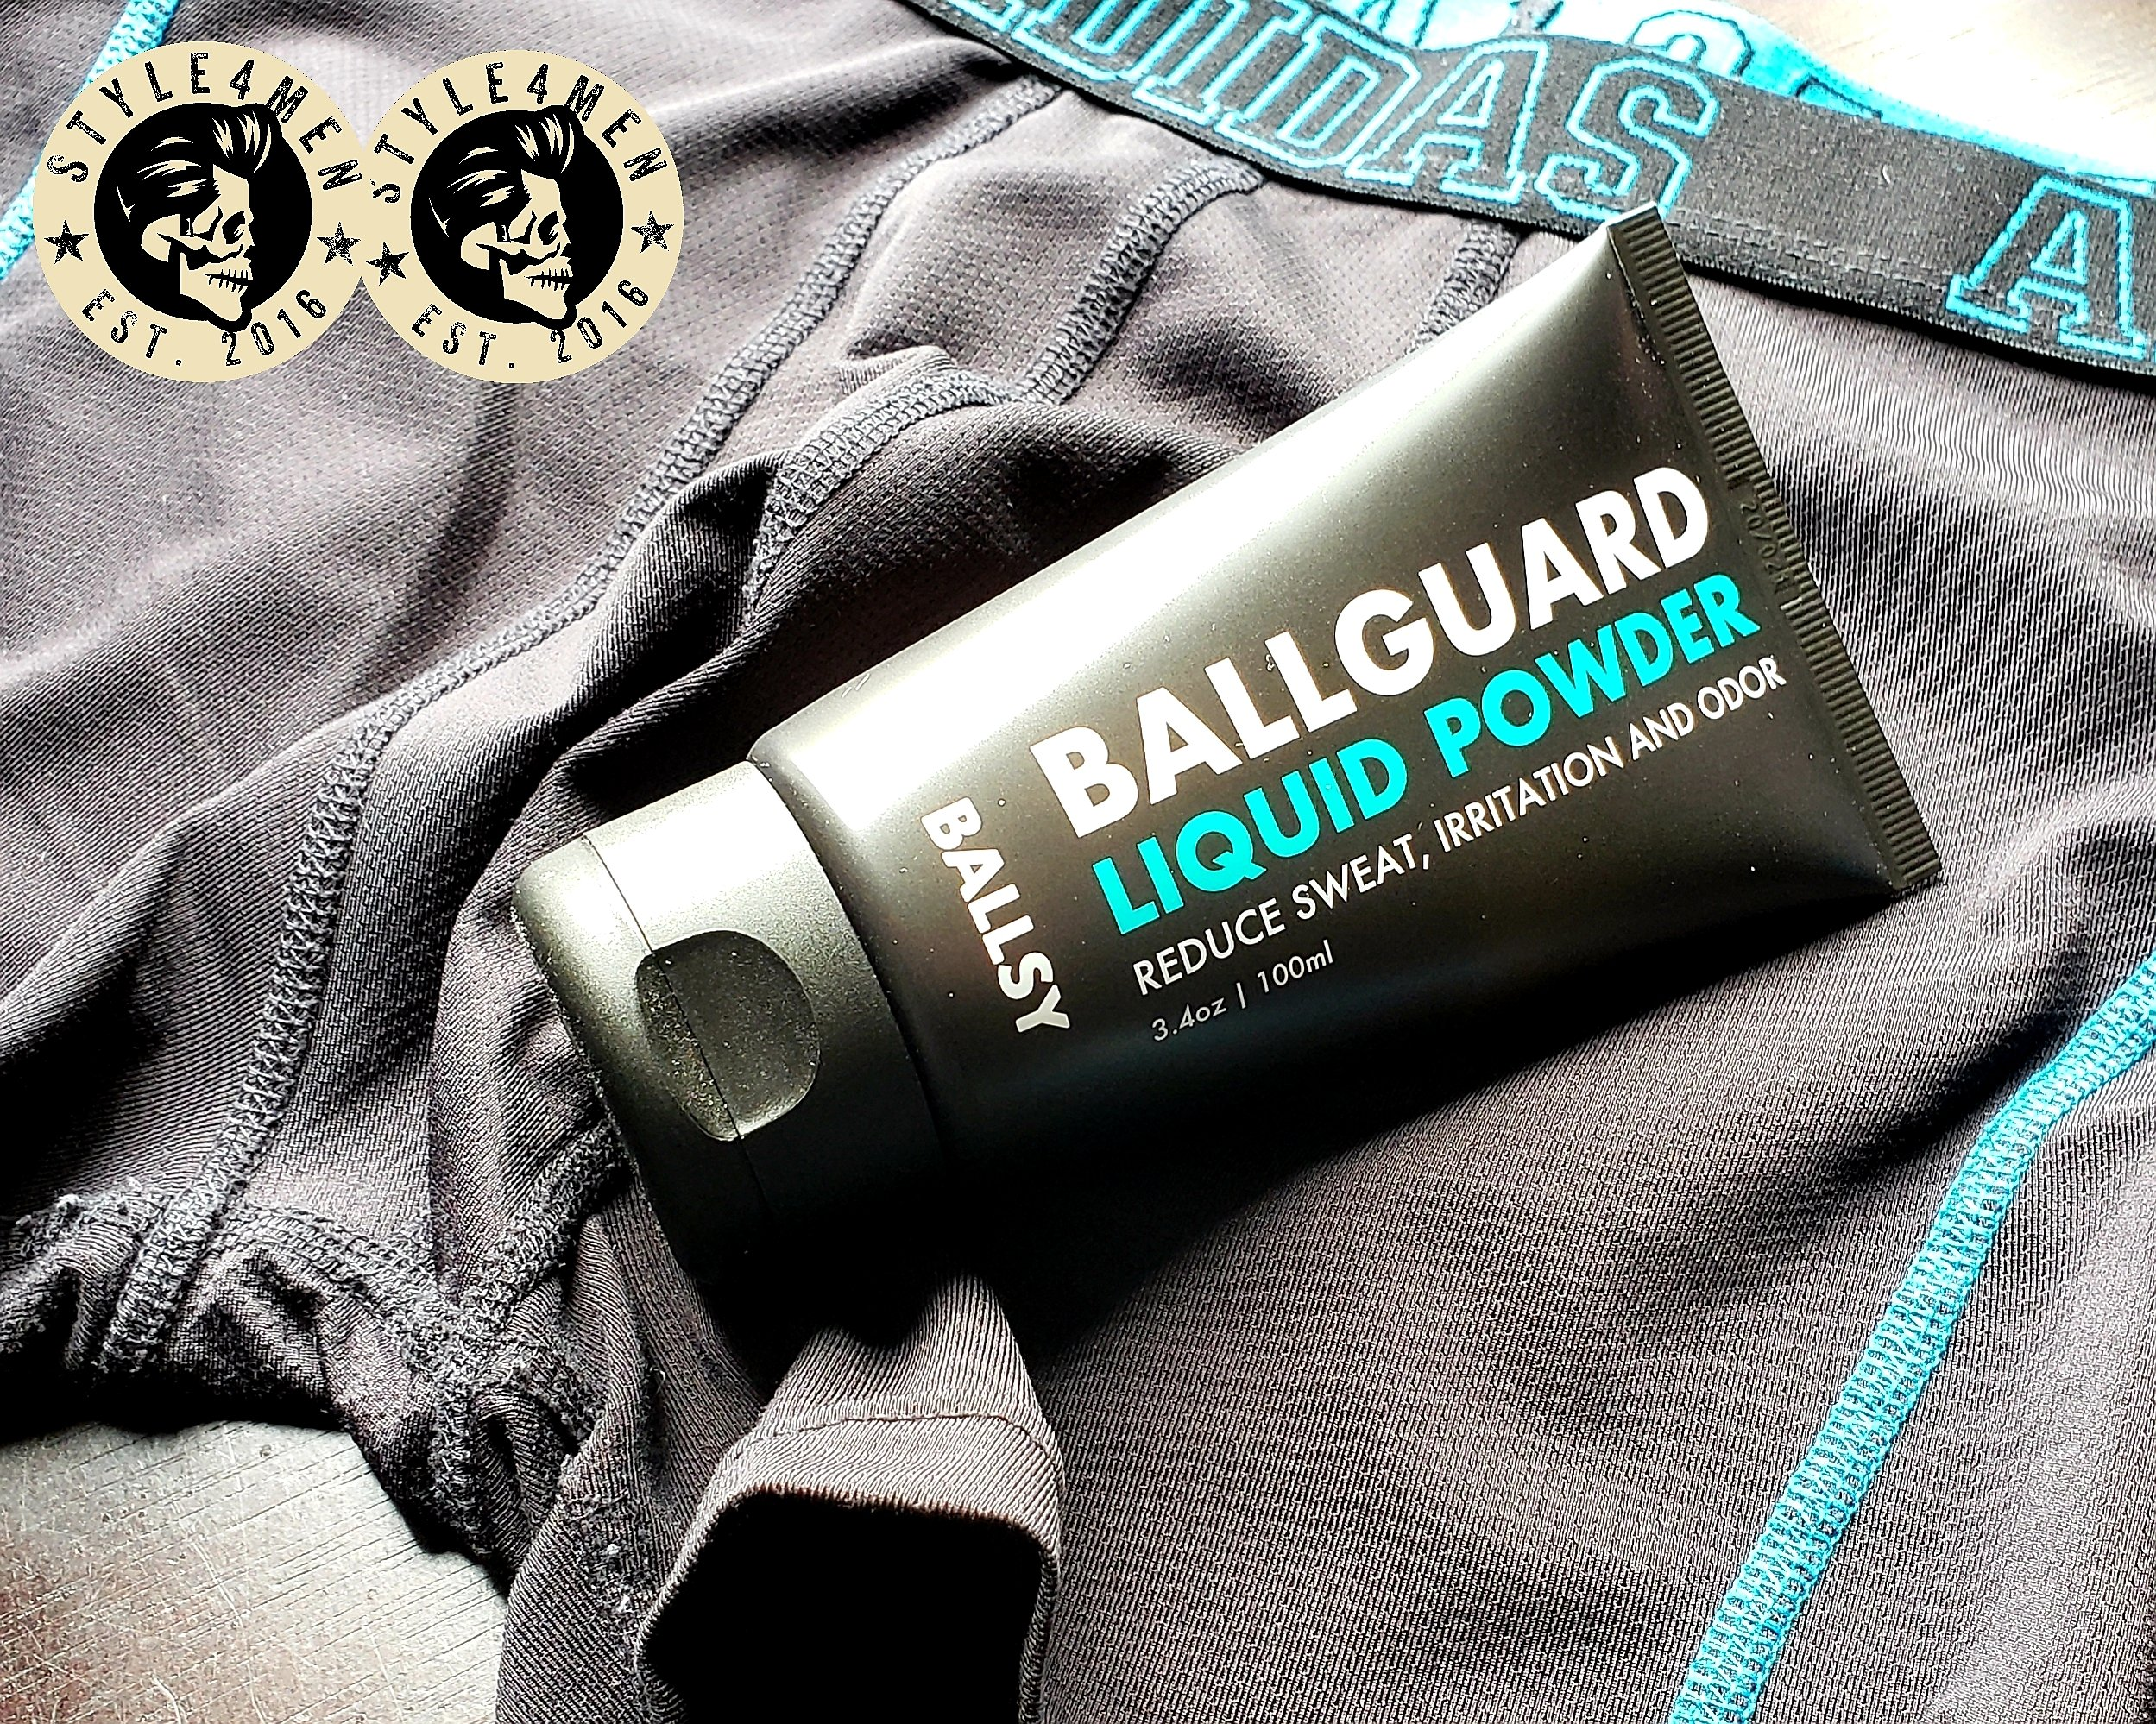 BALLGUARD Liquid Powder by BALLSY